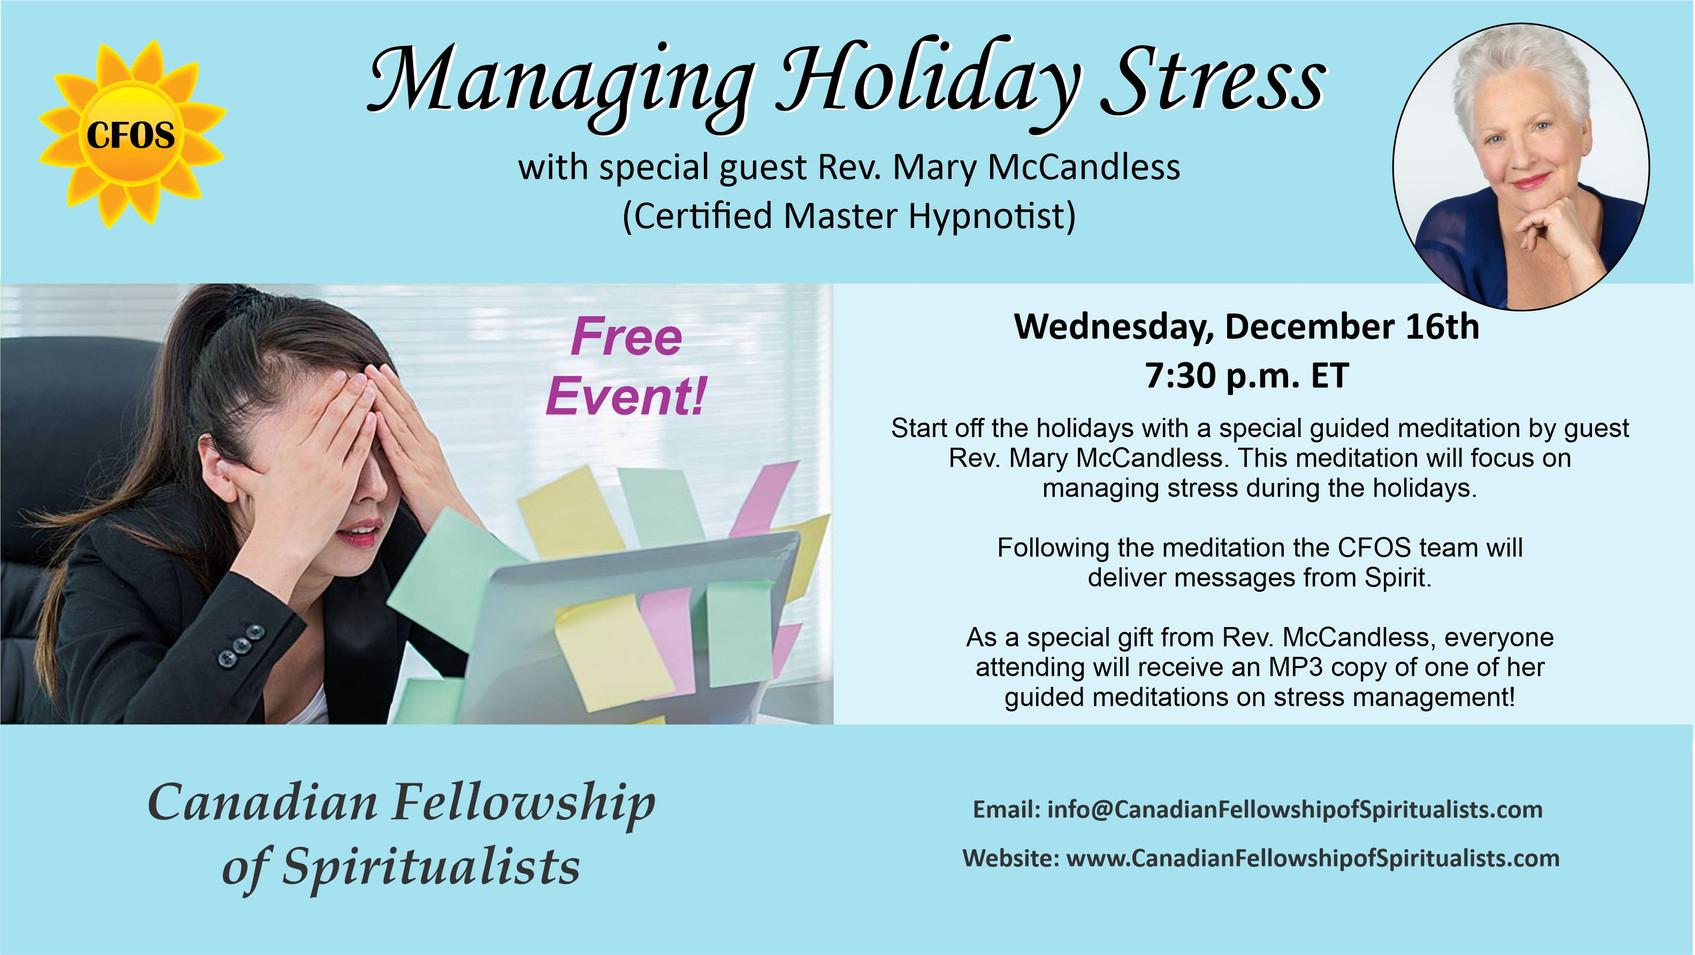 Managing Holiday Stress Meditation